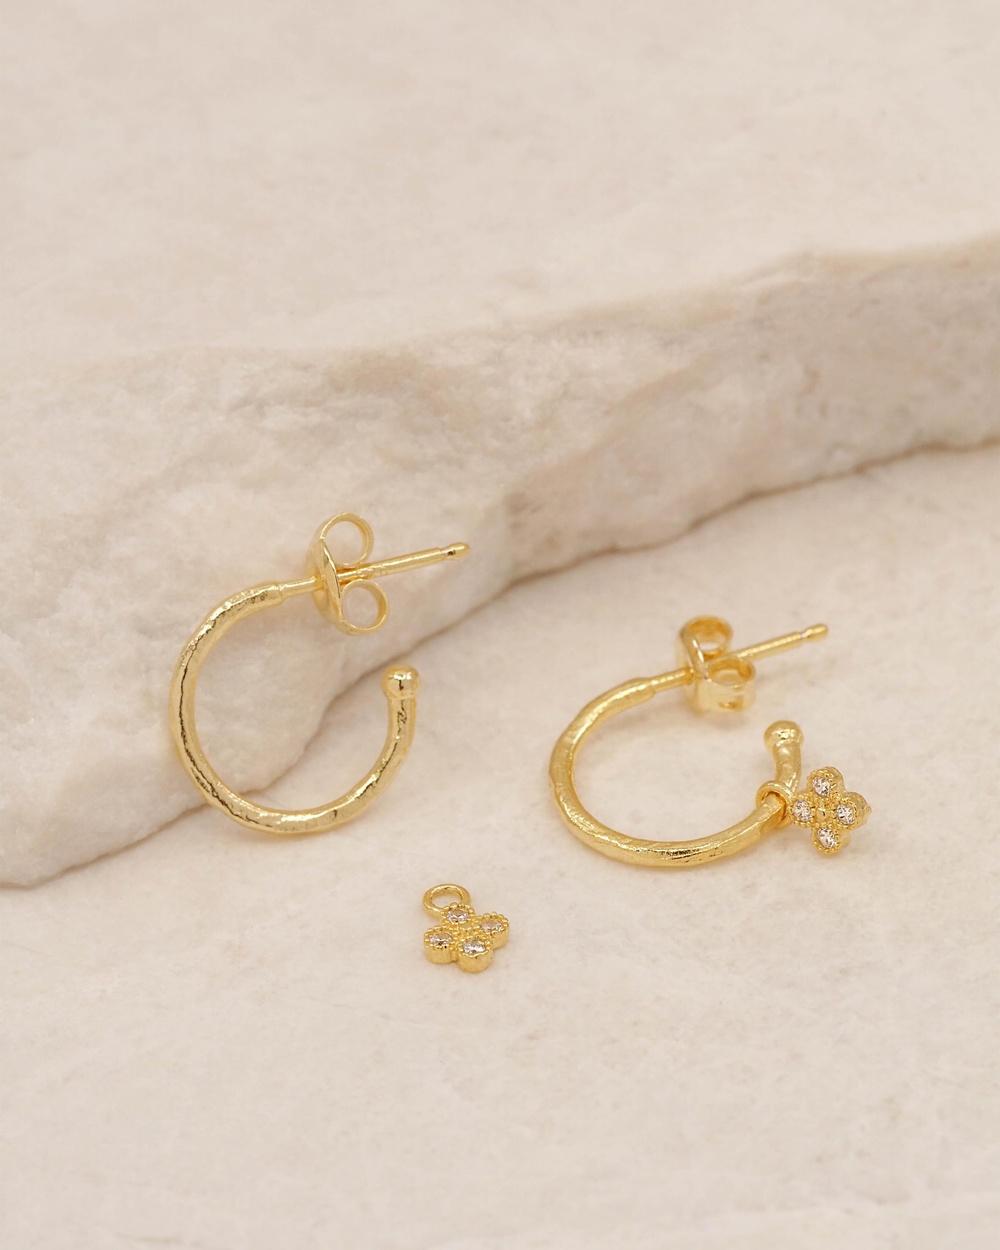 By Charlotte Luminous Gold Hoop Earrings Jewellery Gold